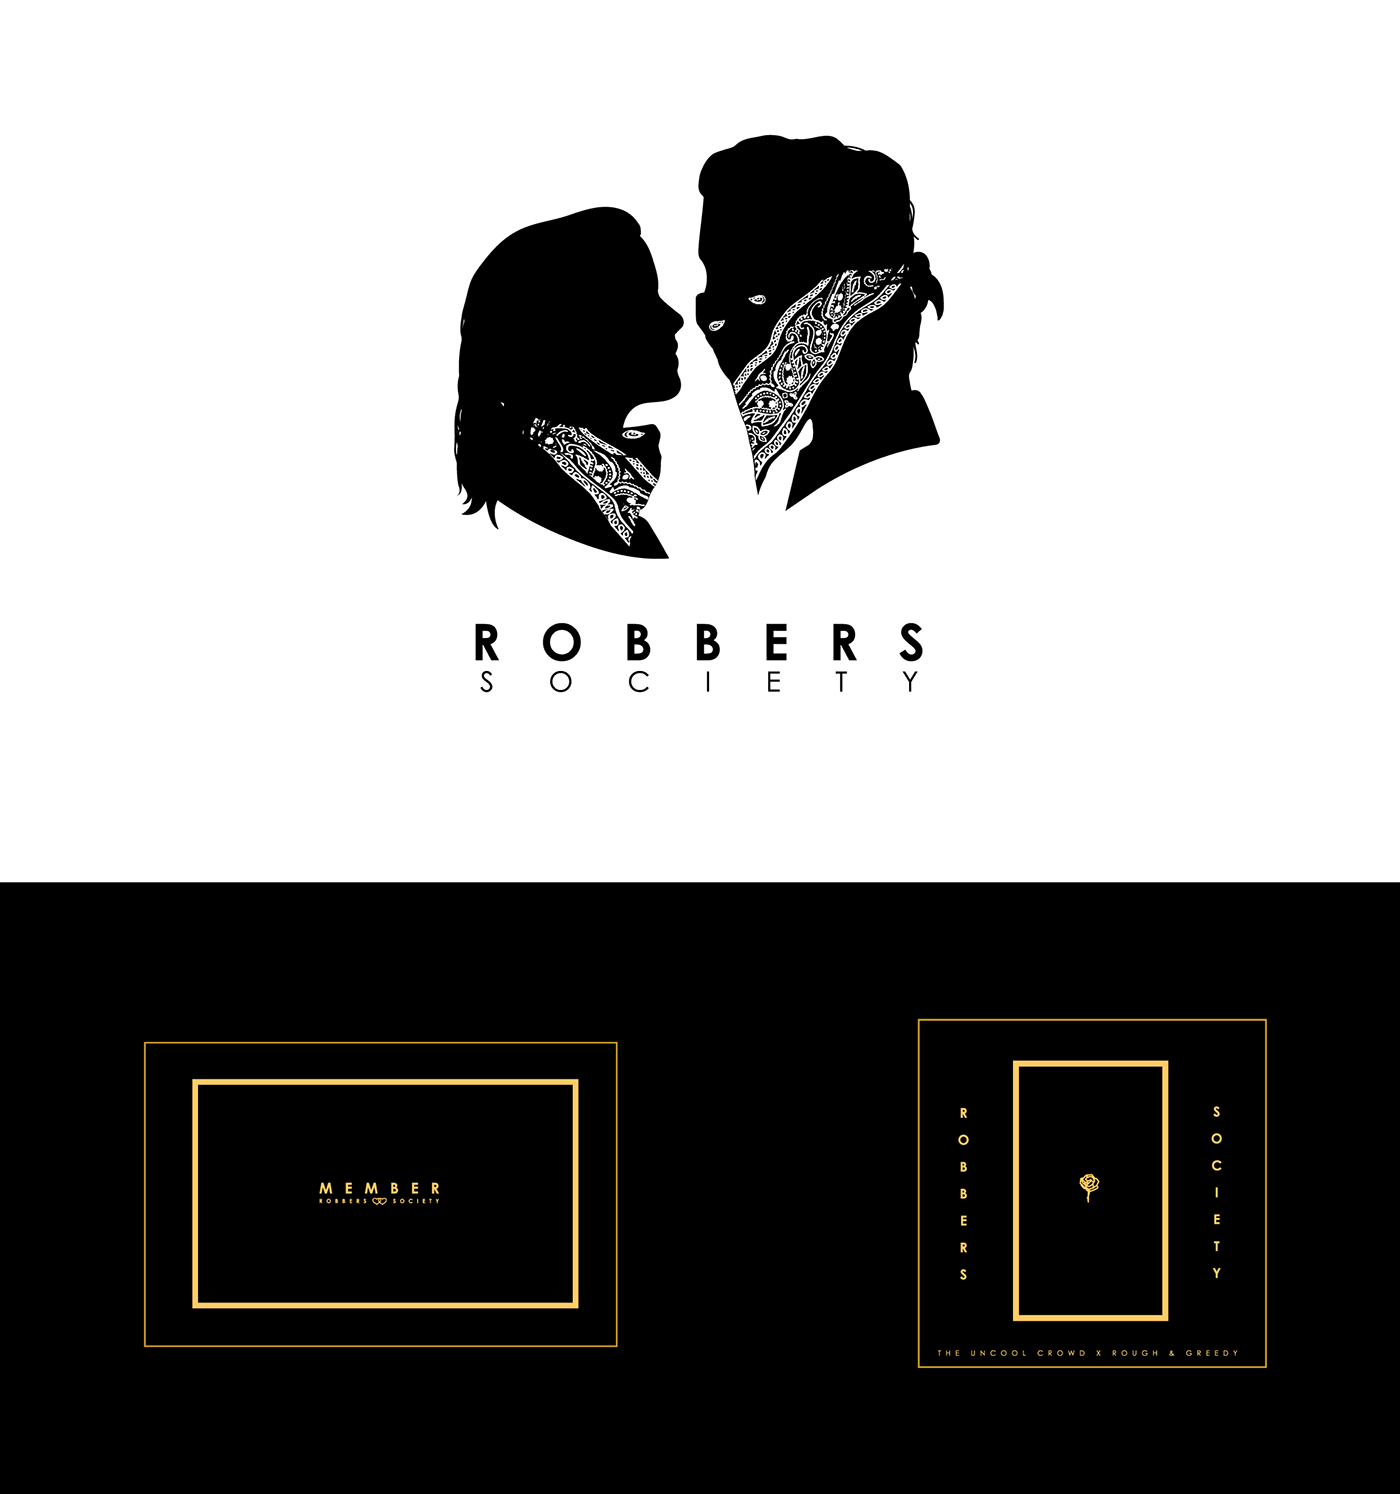 the 1975 matt healy Robbers ILIWYS secret society branding  product design  Logo Design clothing design